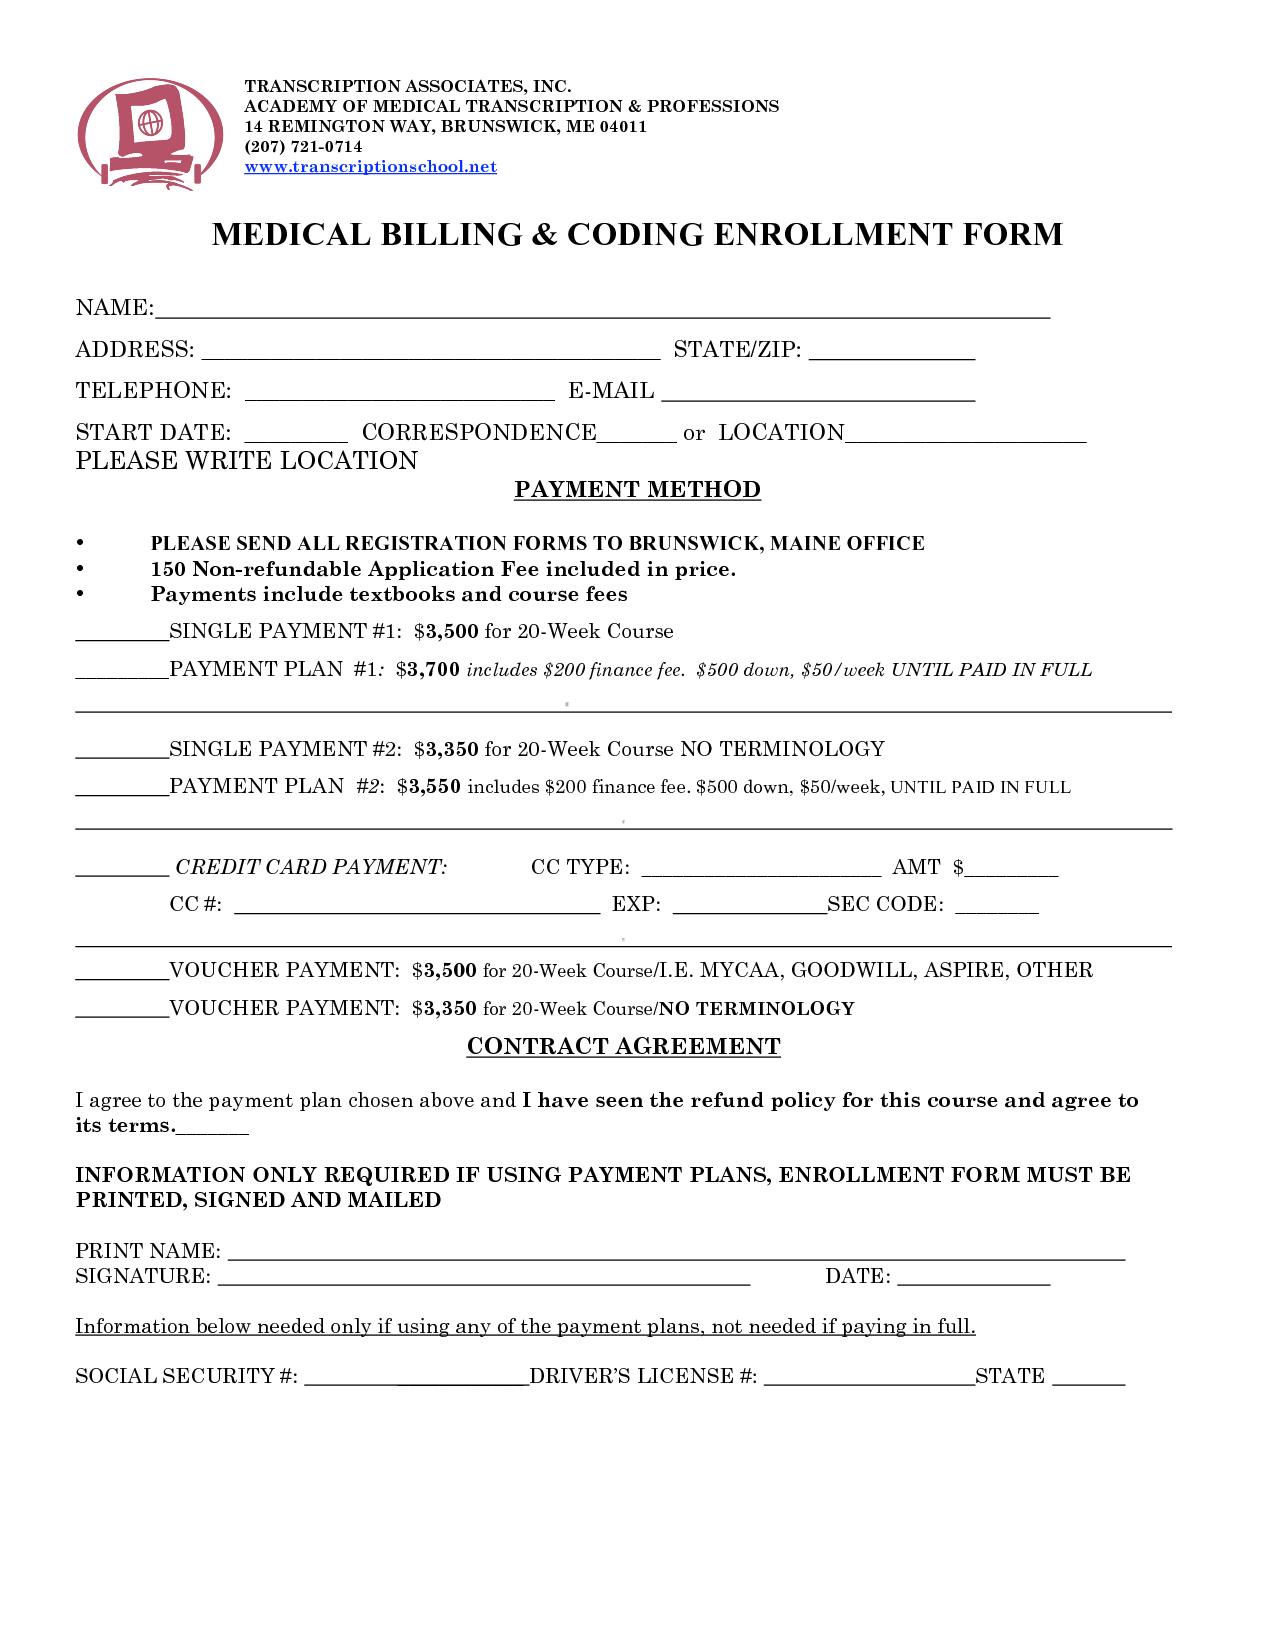 Medical Billing Resume Sample Free and Medical Billing and Coding Resume Resume for Your Job Application